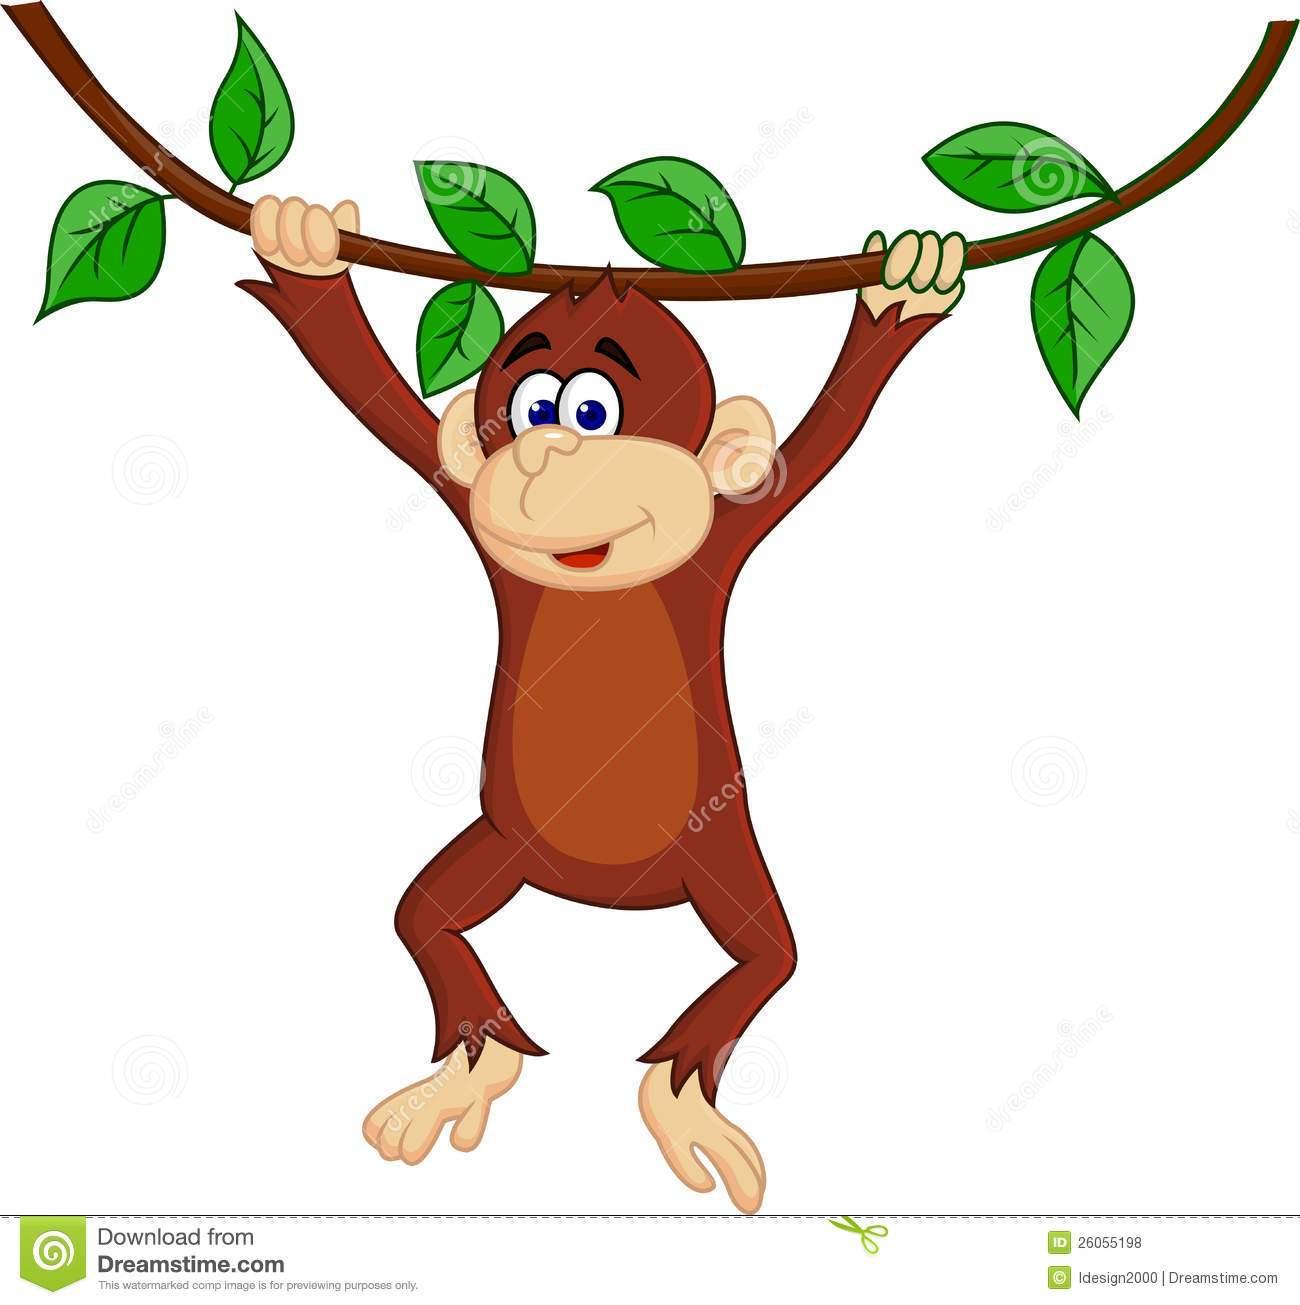 Swinging monkey clipart 3 » Clipart Portal.